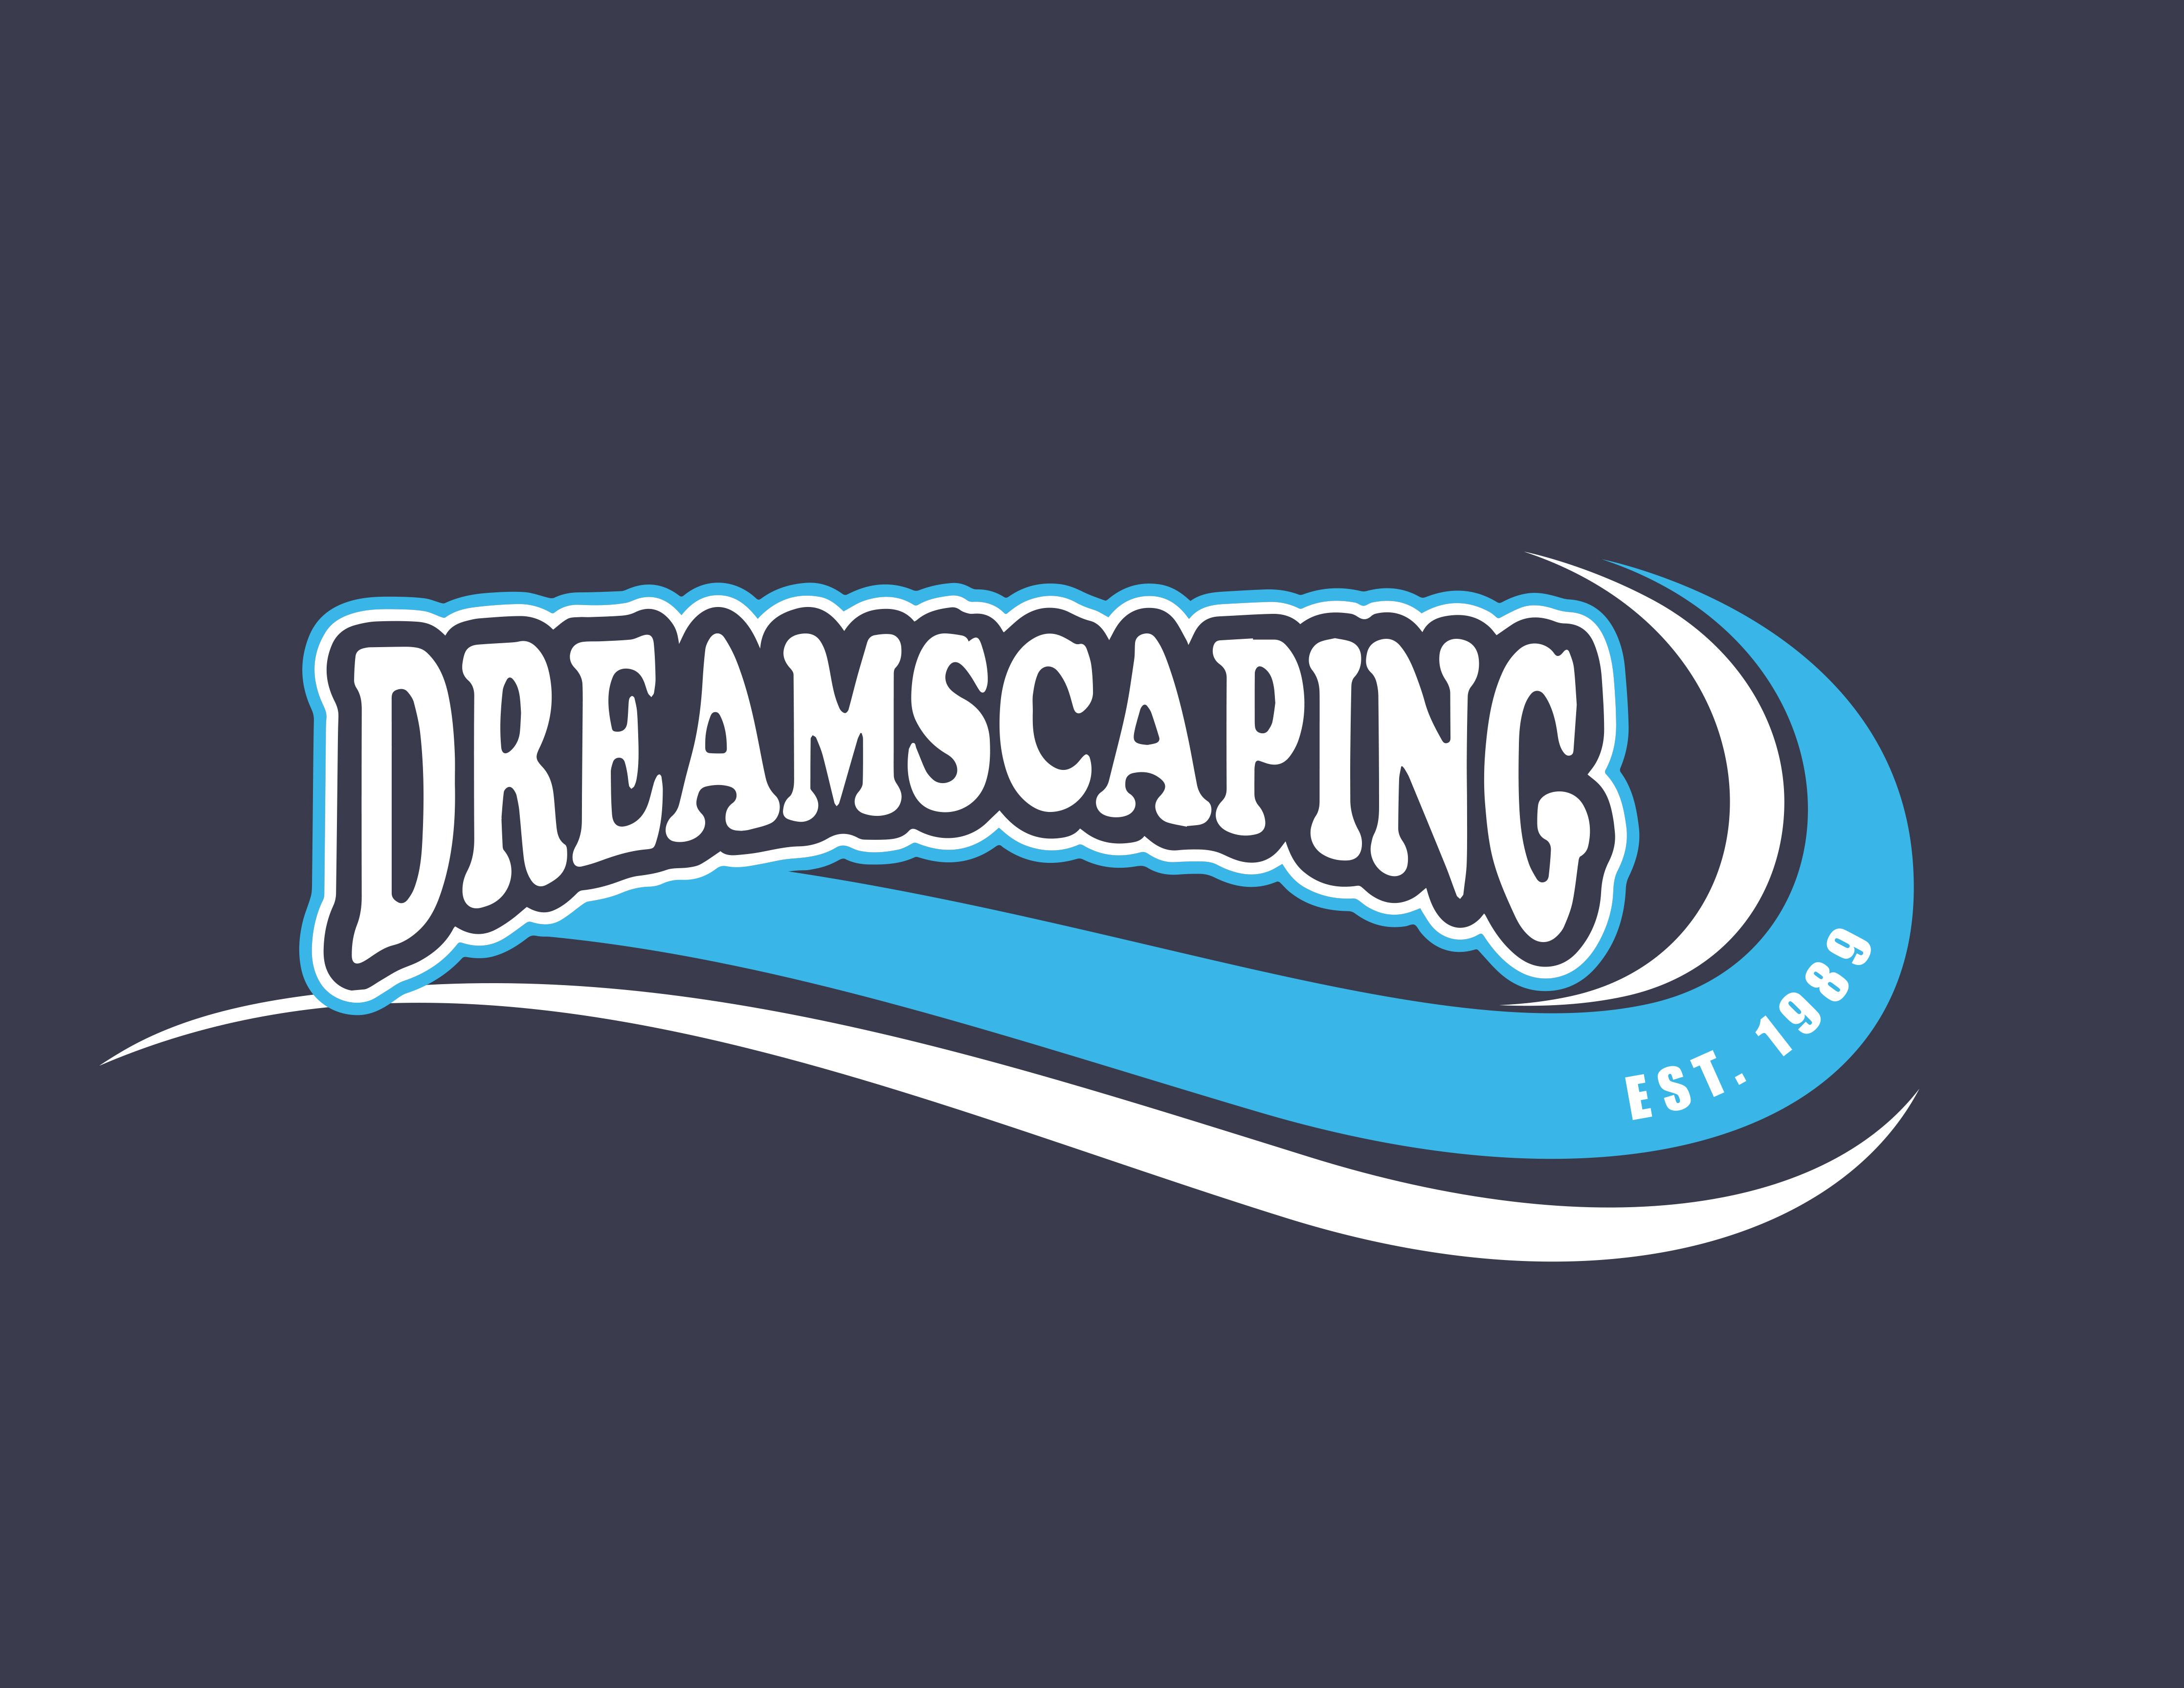 DREAMSCAPING - TSHIRT FINAL-1